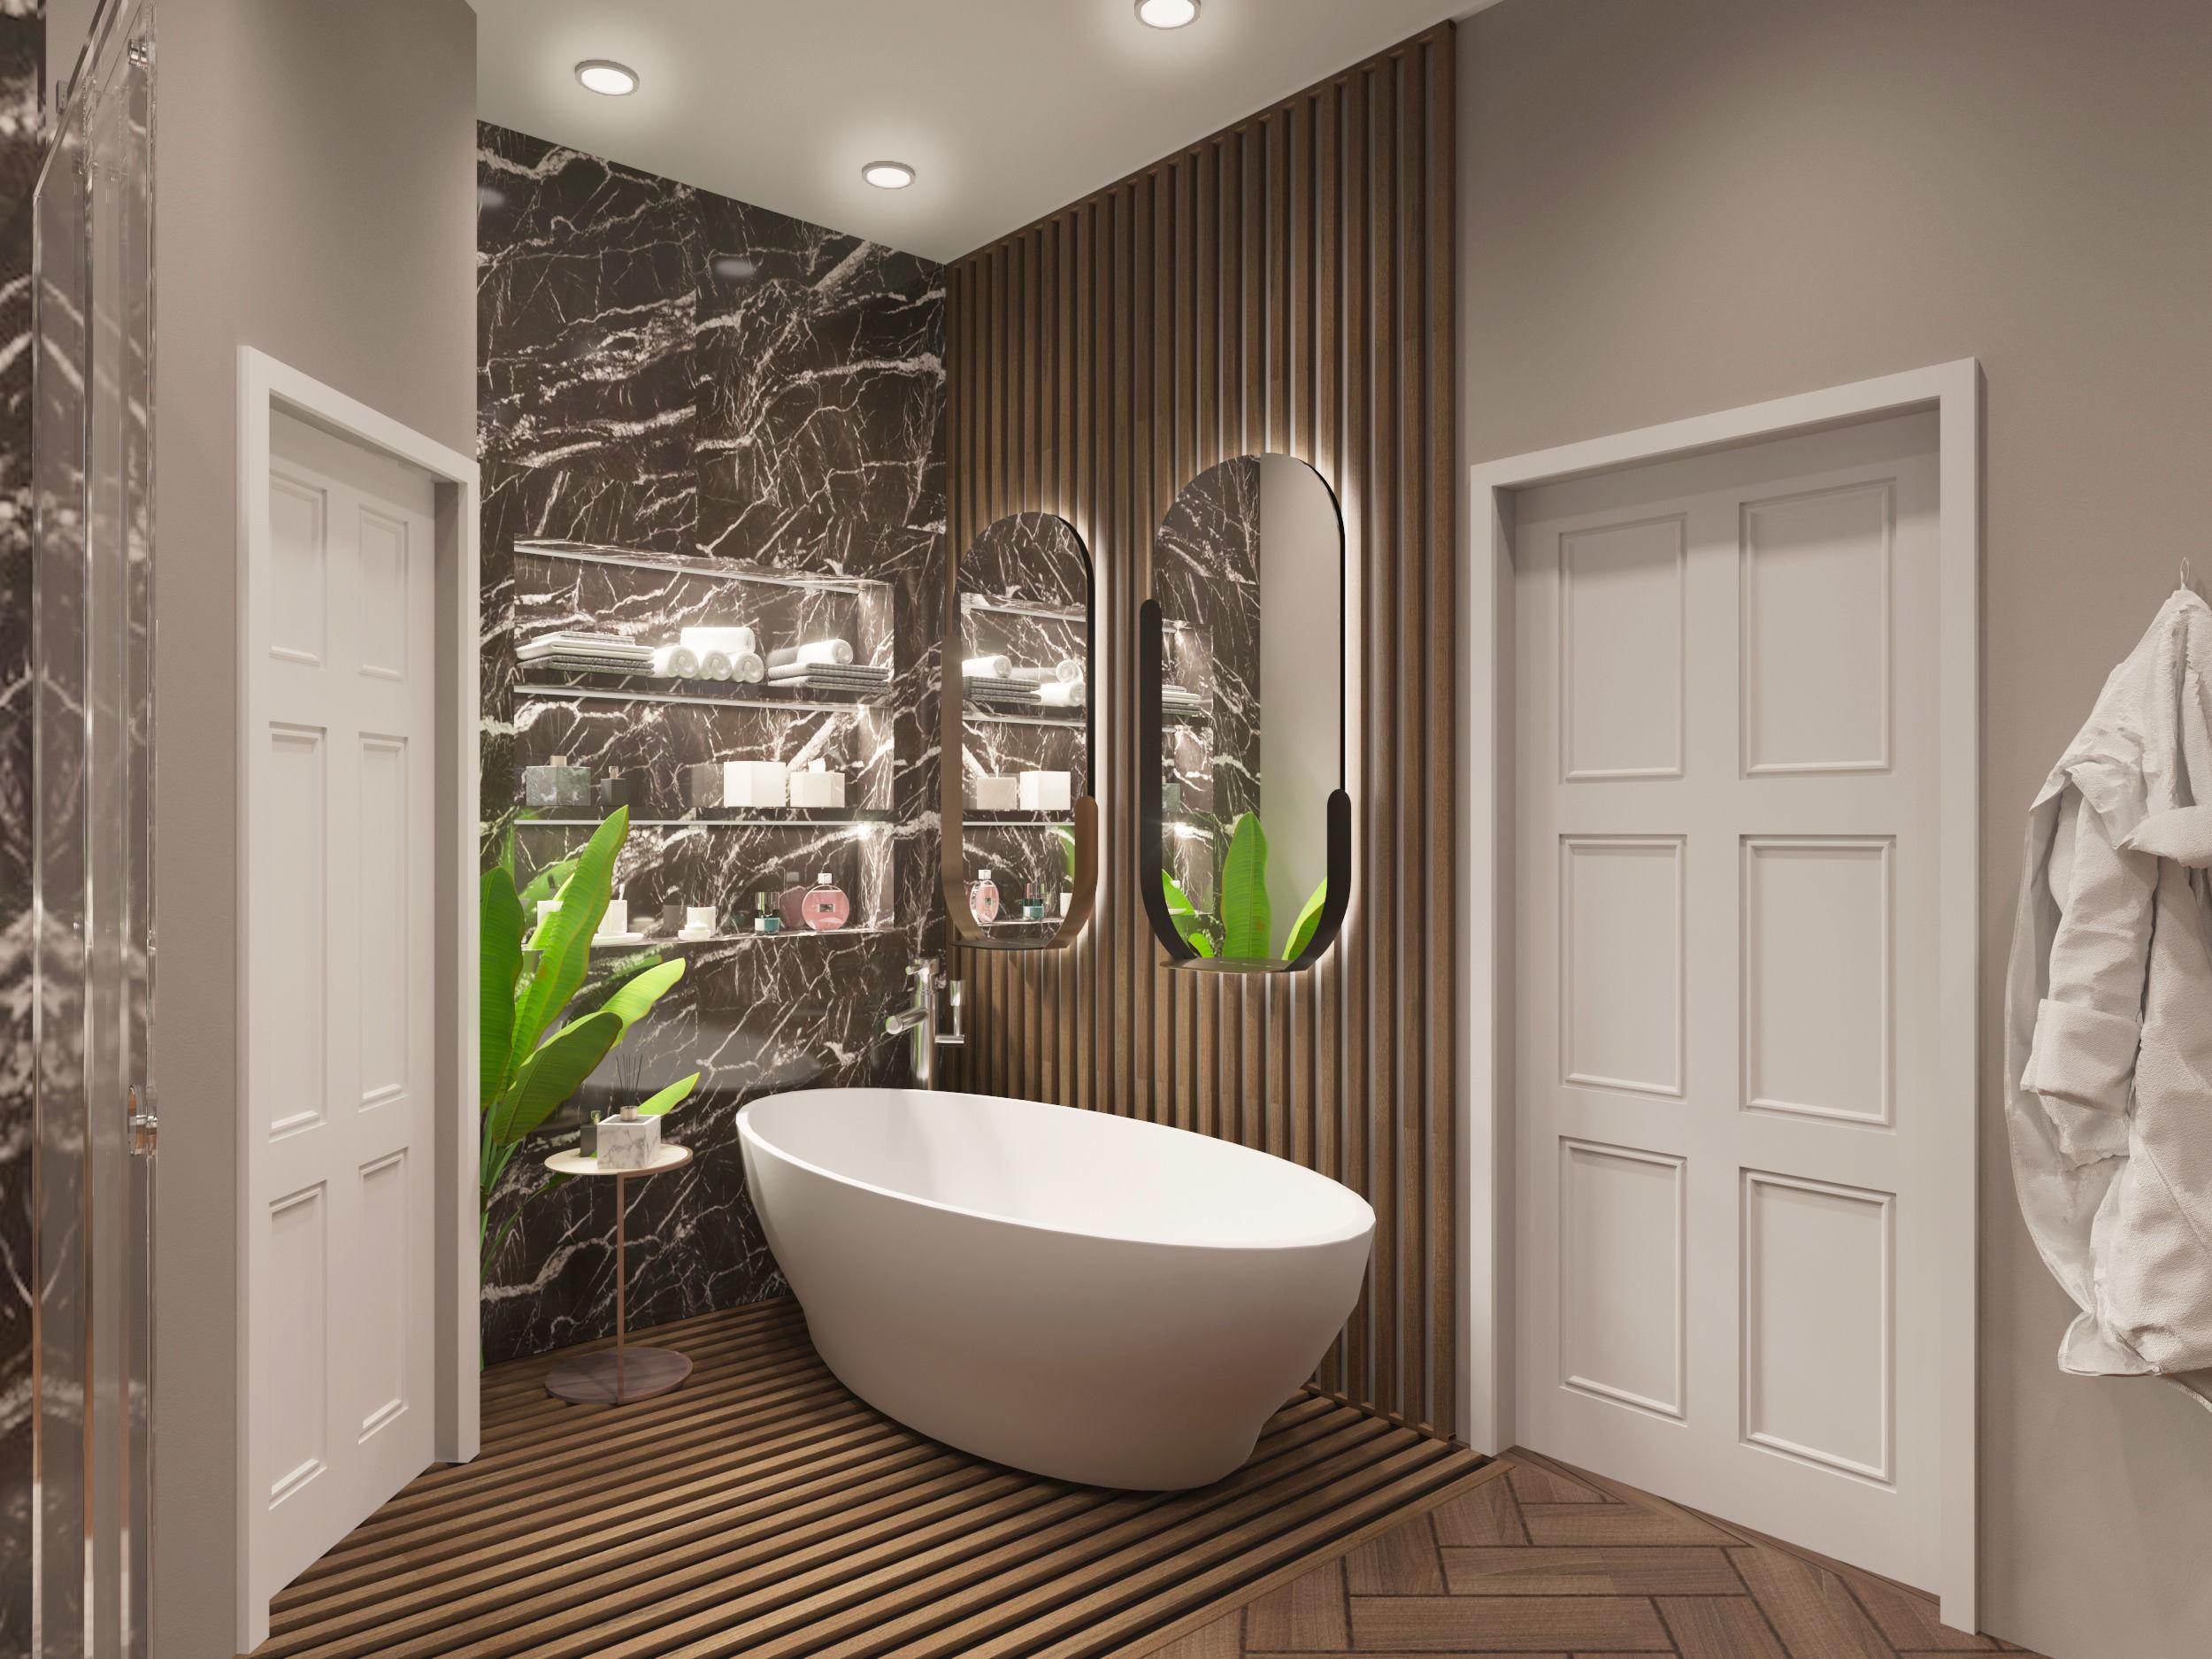 3D Bathroom model with sanitary ware - Corona materials on Bathroom Model  id=59243